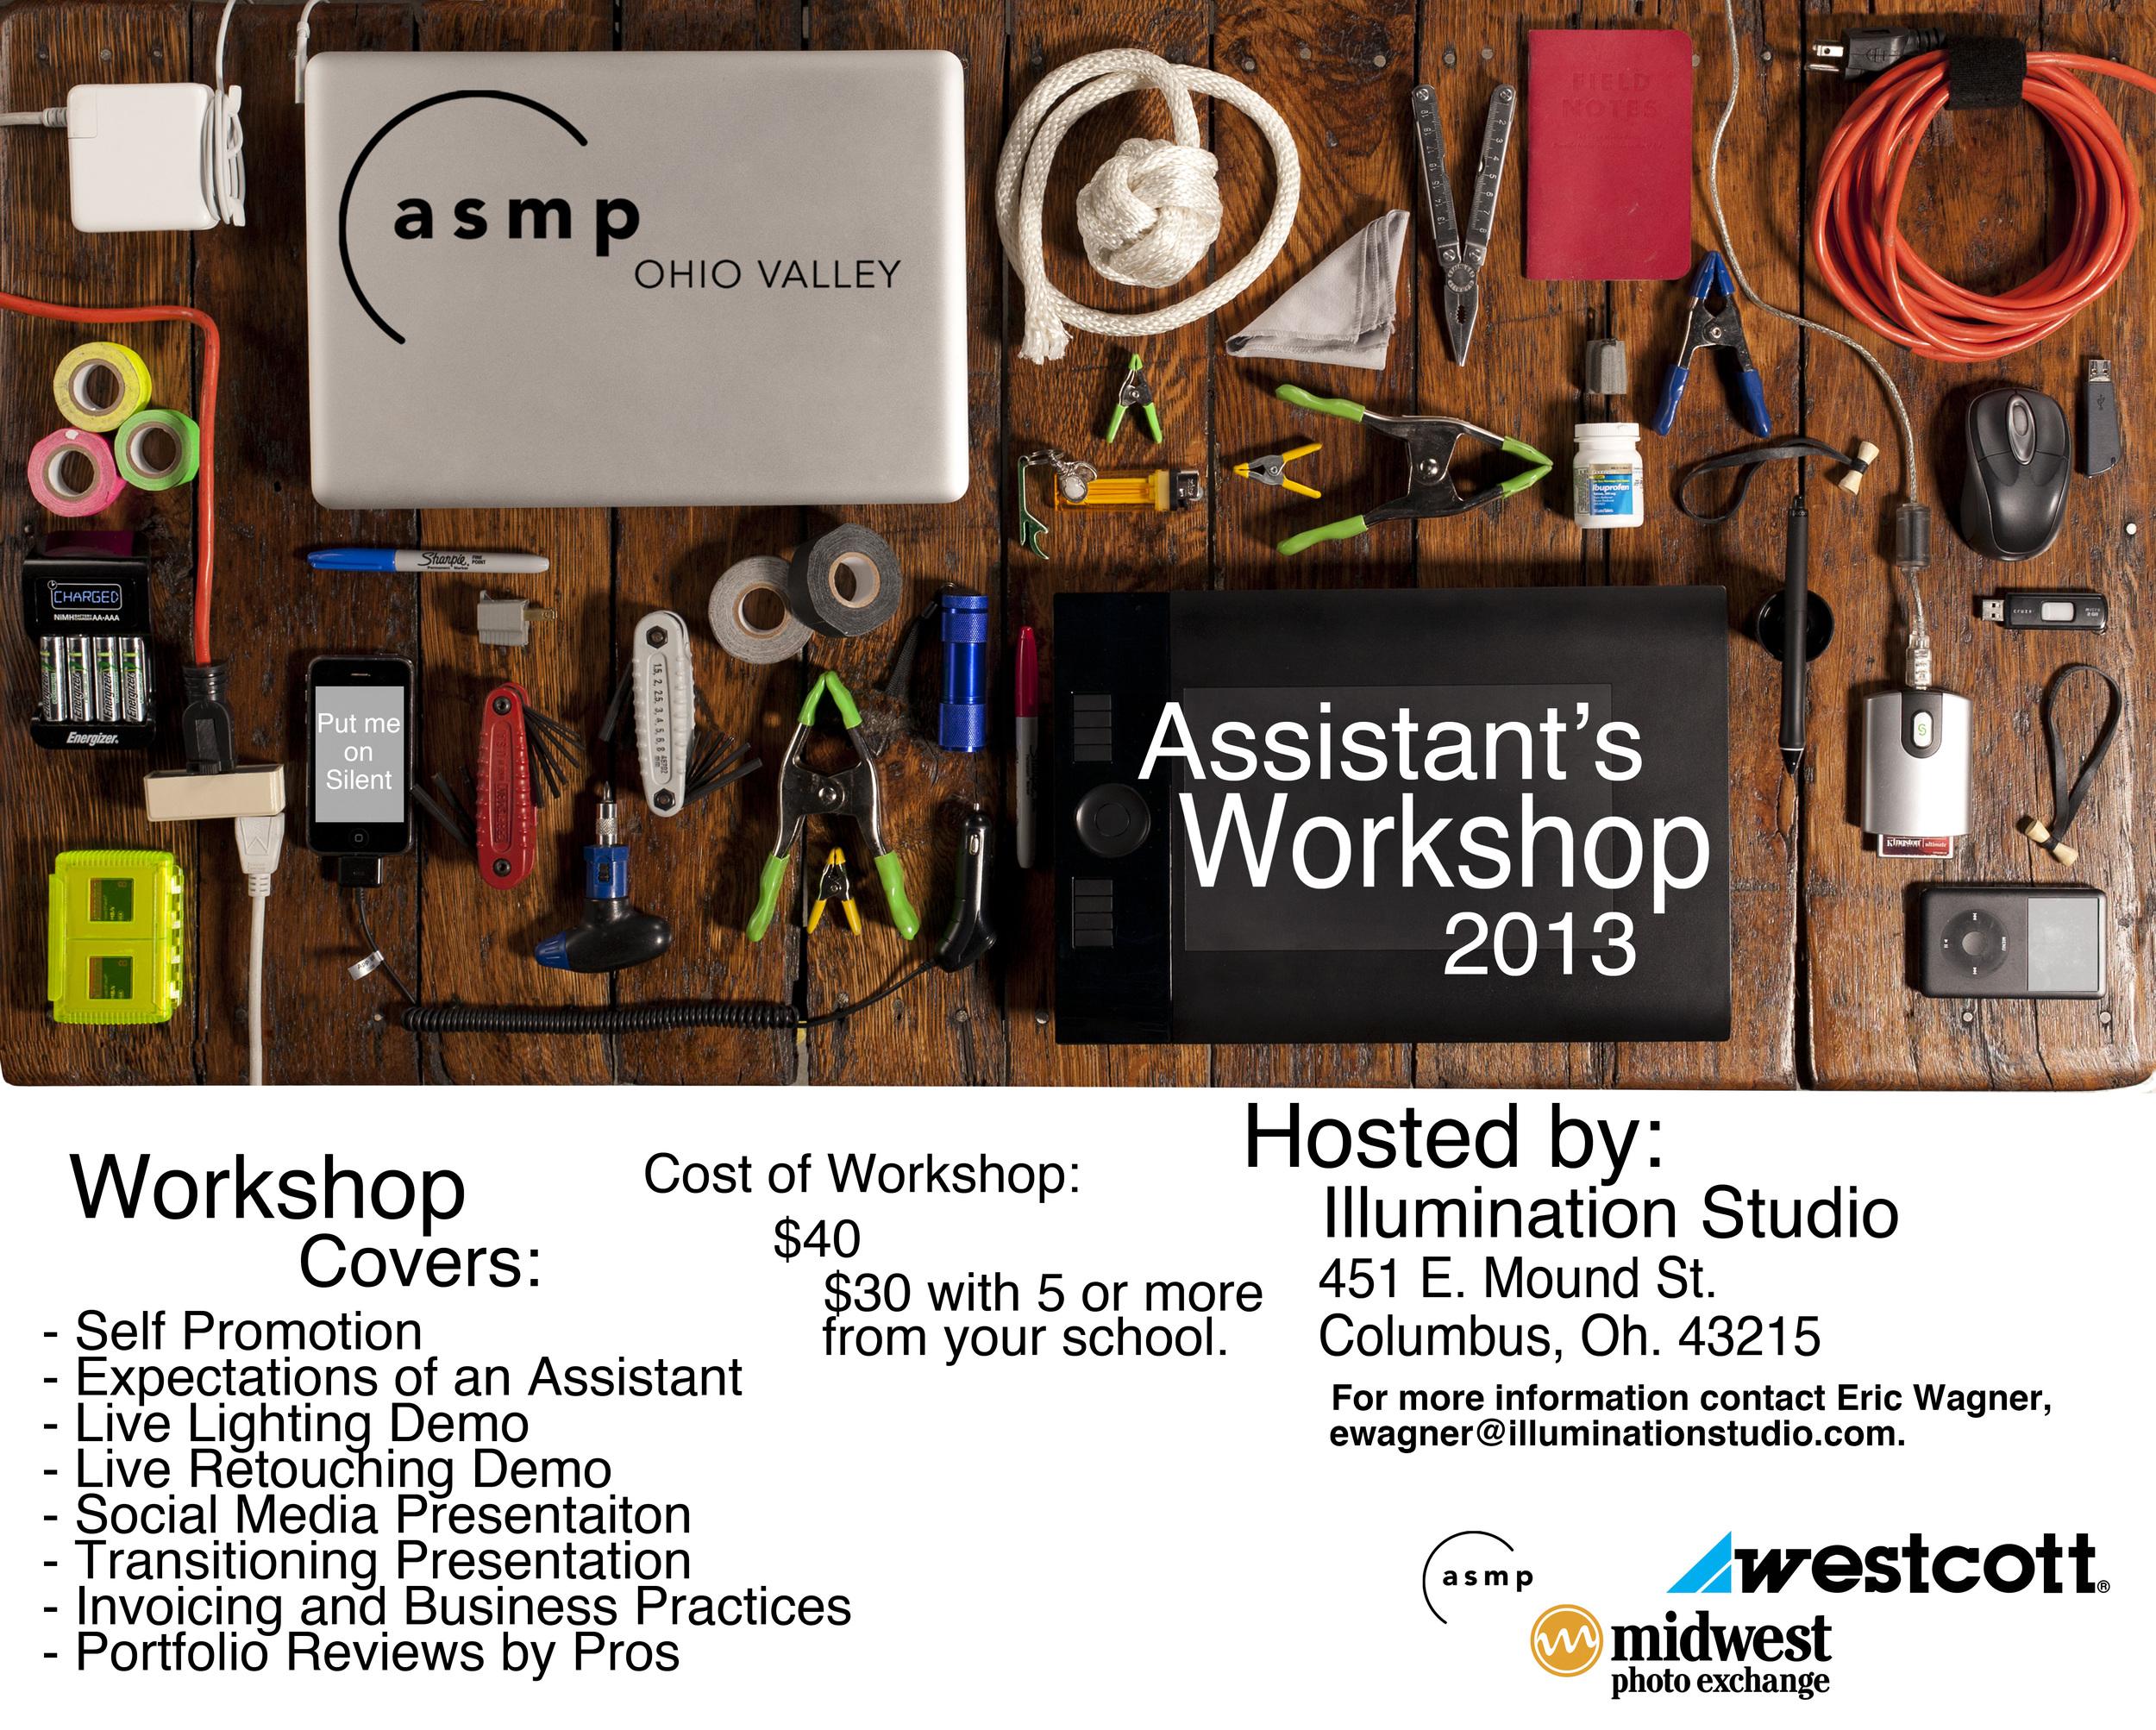 ASMP Ohio Valley Assistant's Workshop